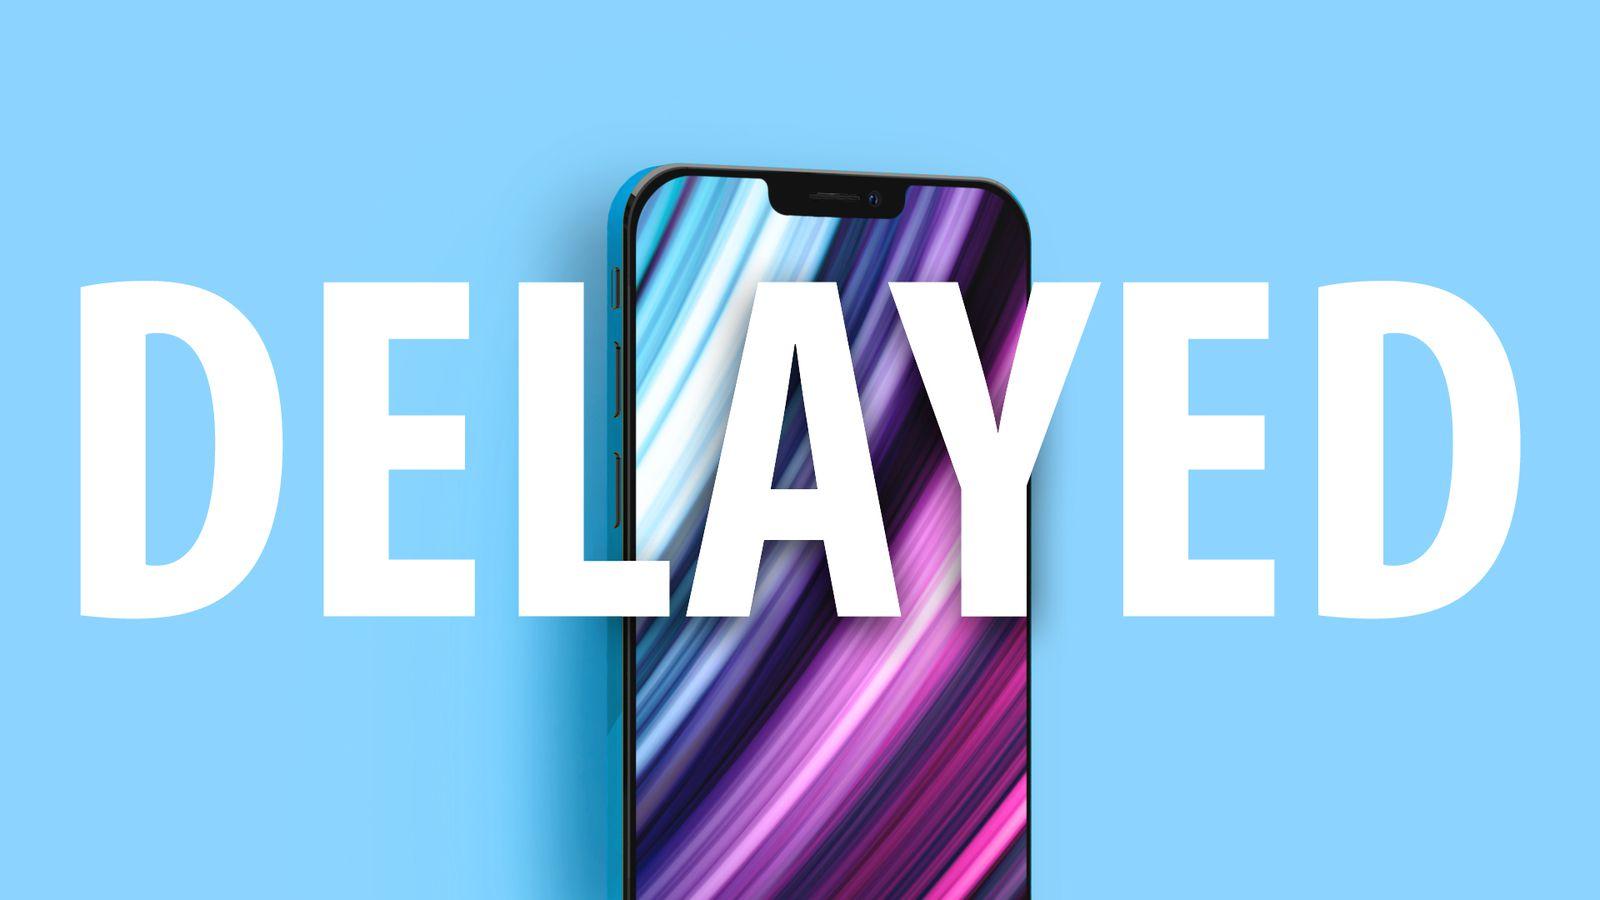 iPhone 12 Delayed 2